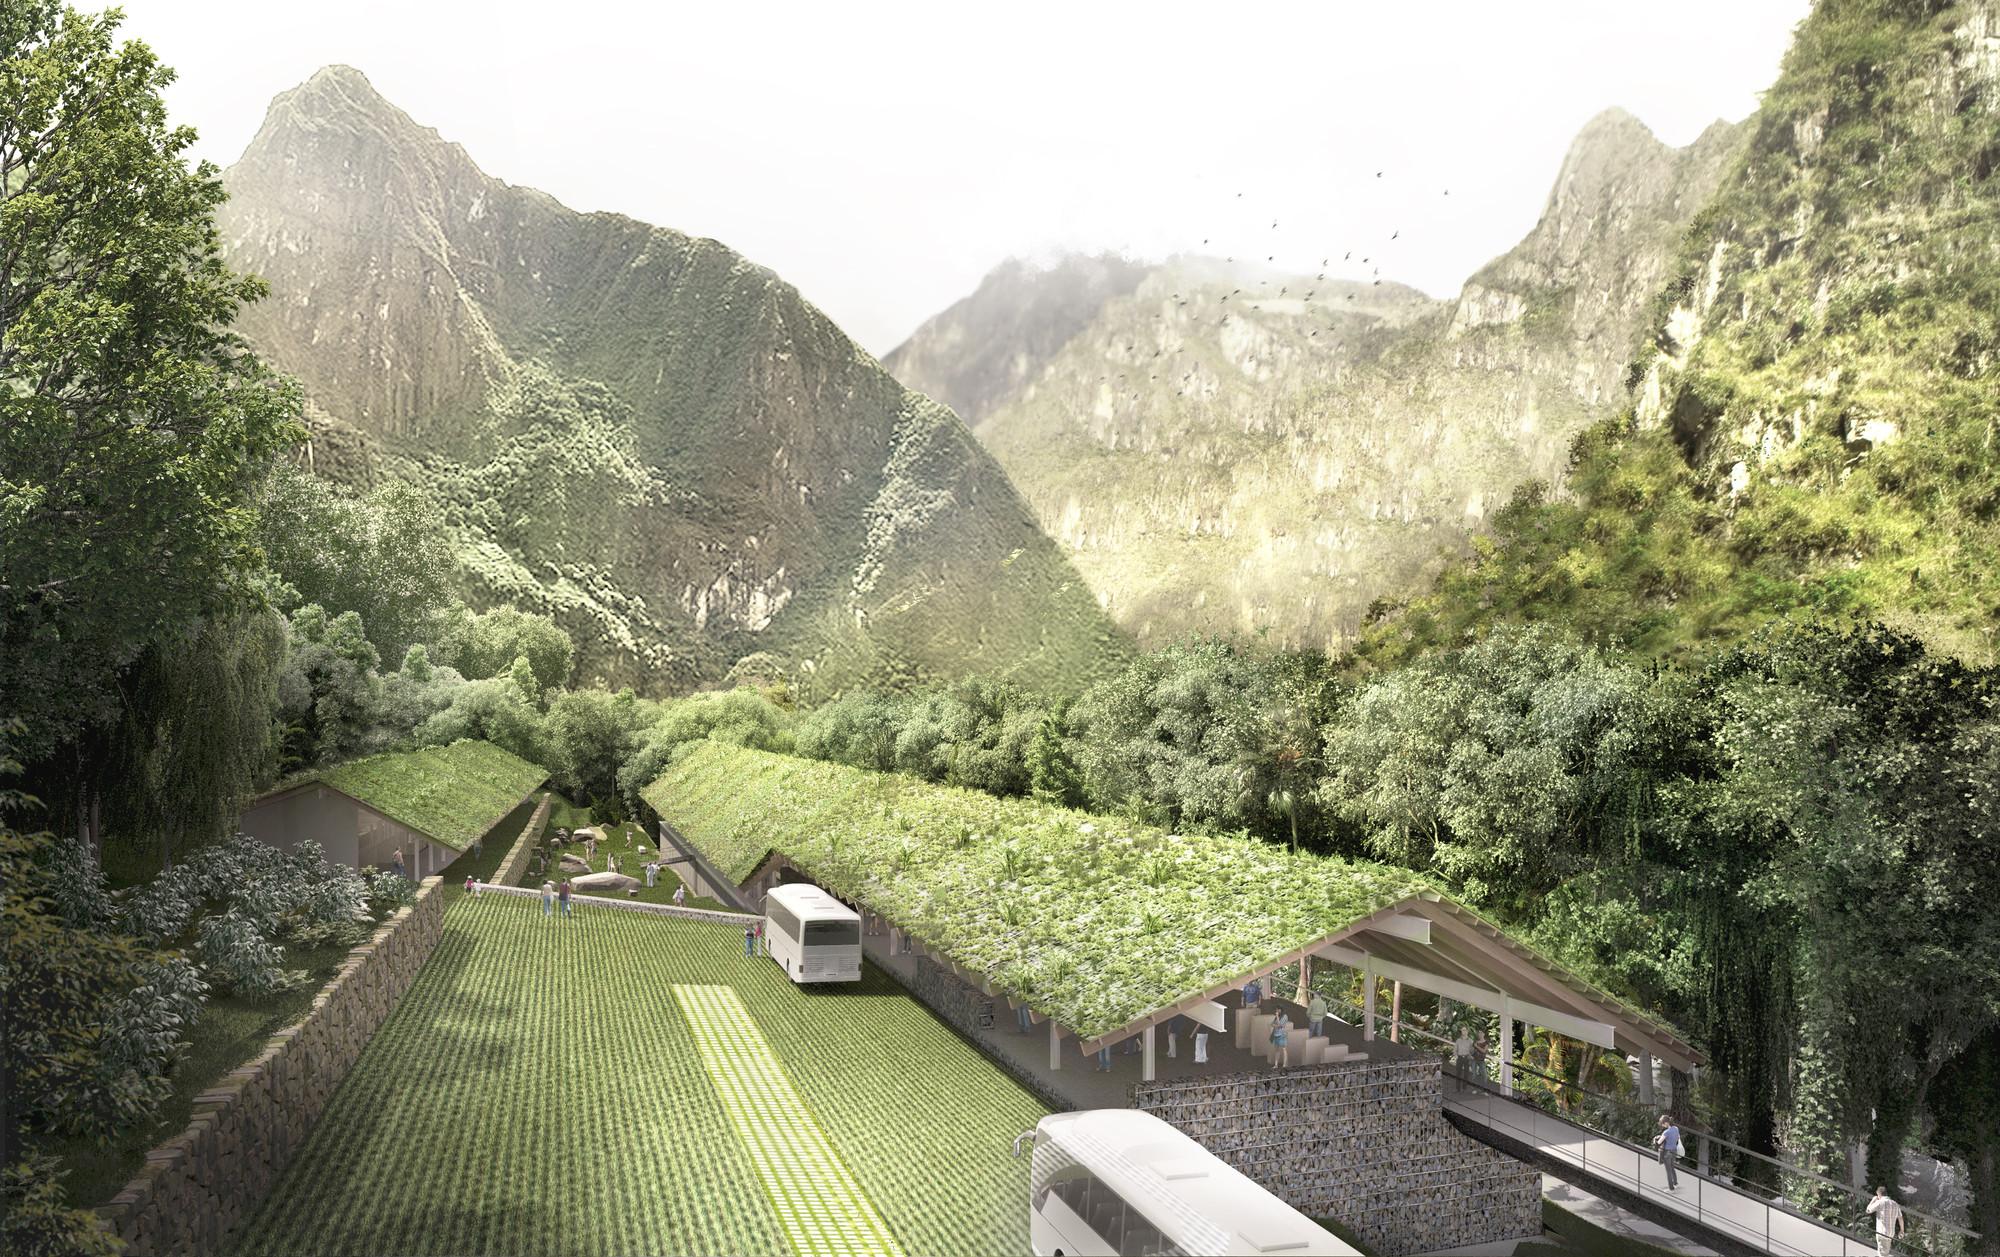 Segundo Lugar en concurso de ideas para futuras intervenciones en Machu Picchu / Perú, Acceso. Image Courtesy of Canziani-Román-Bauer Arquitectos